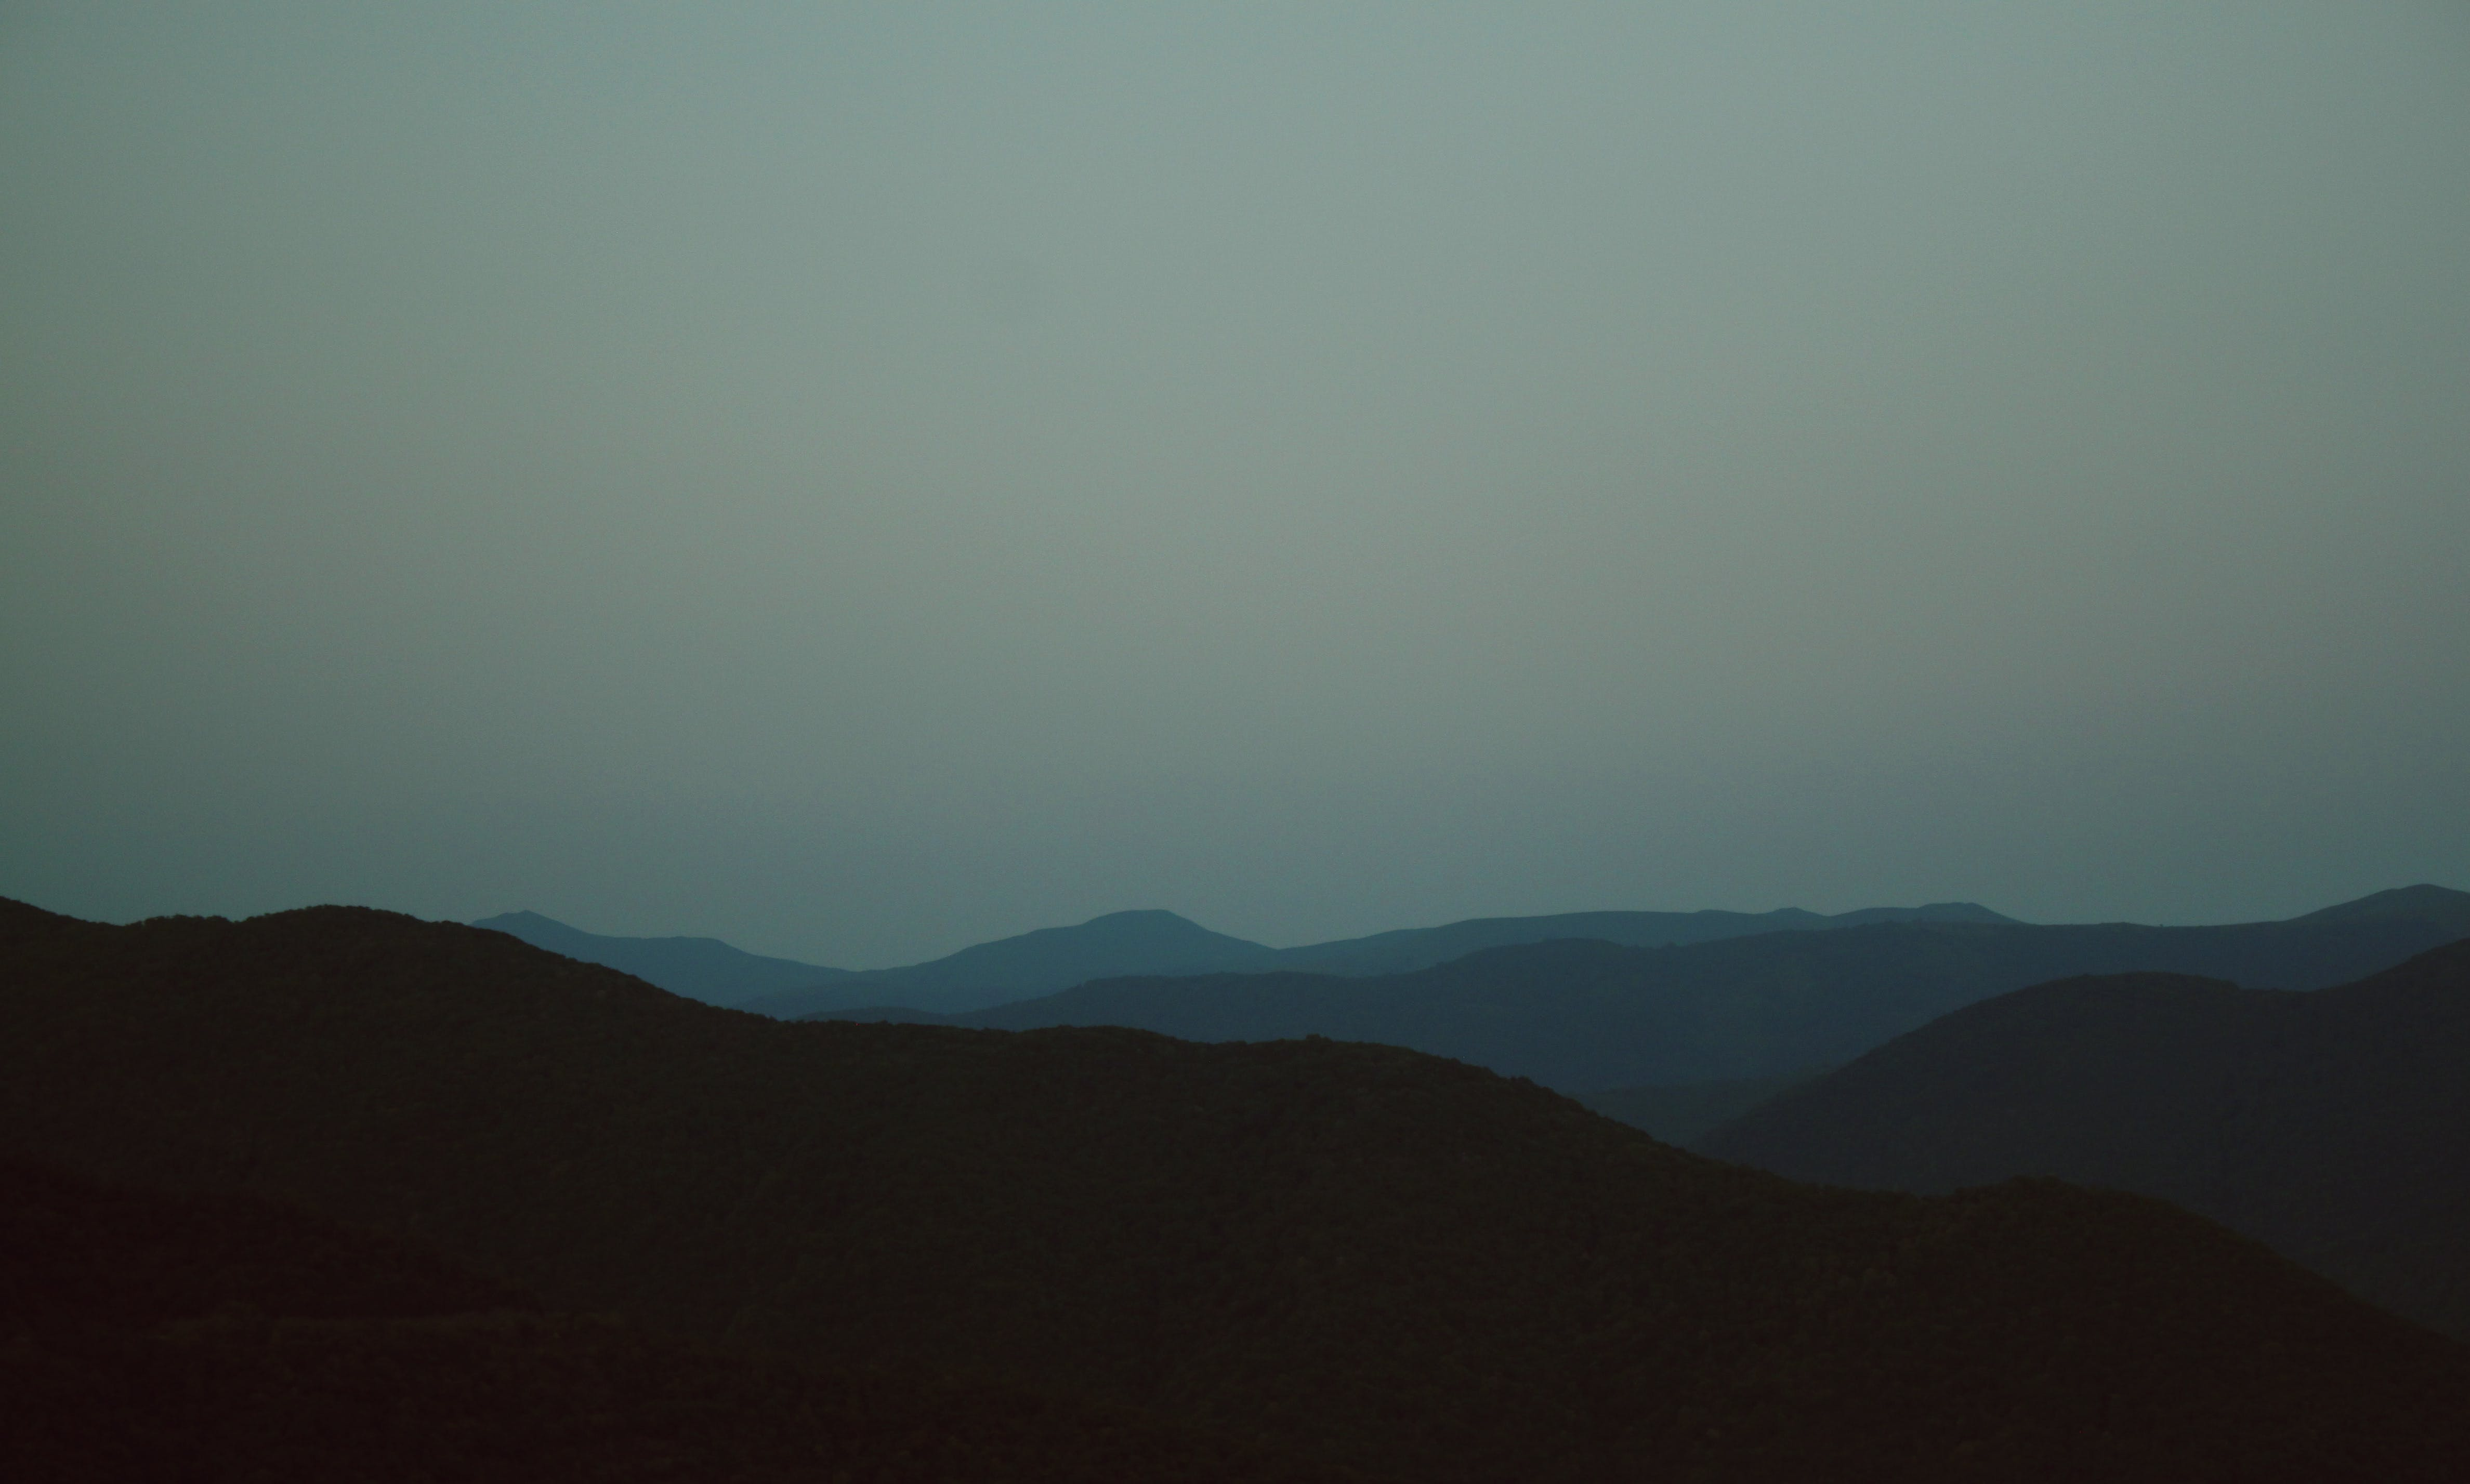 Free stock photo of mountains, nature, sky, dark